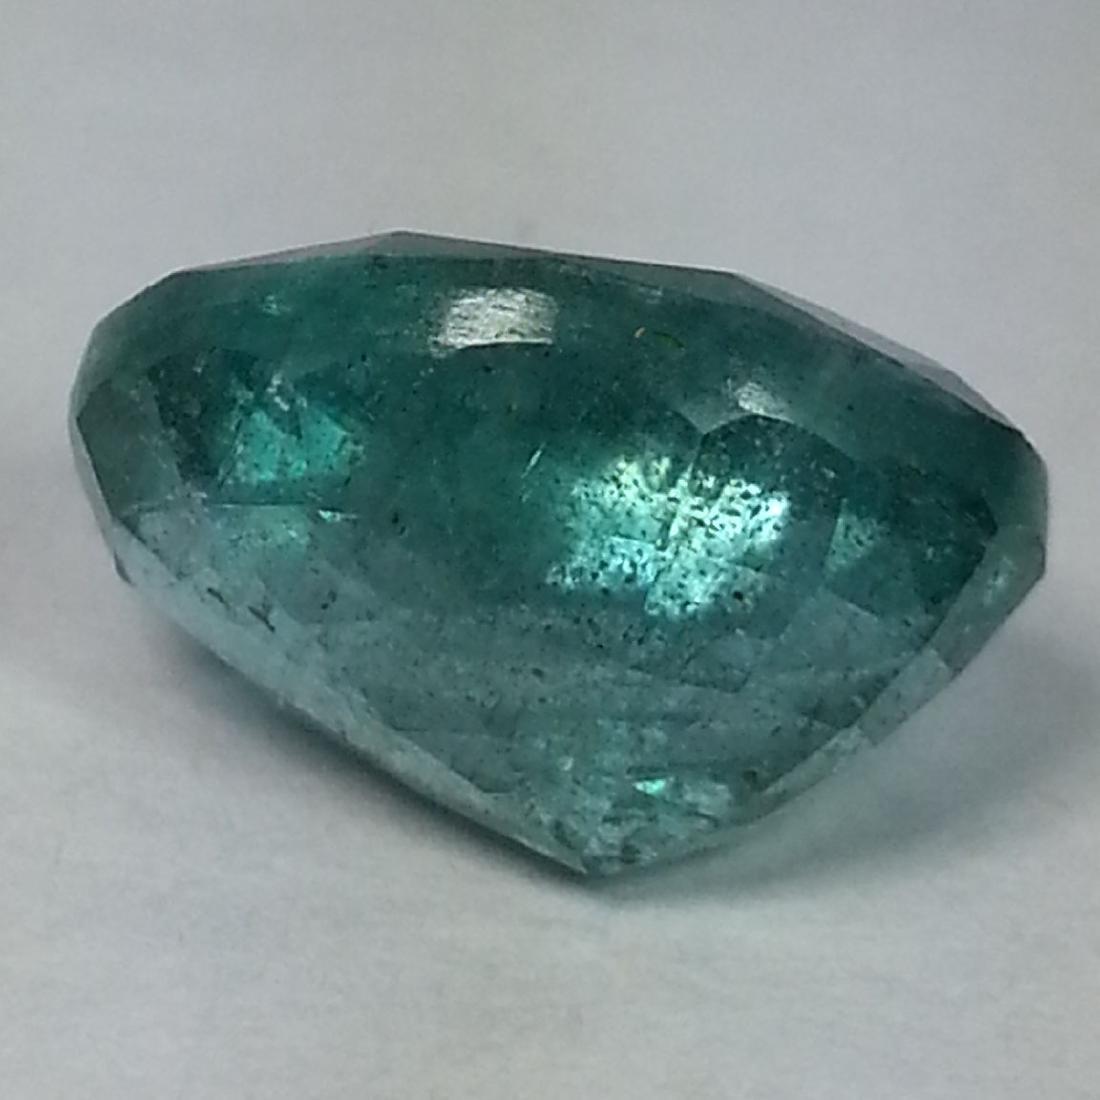 Emerald - 3.08 ct - 3